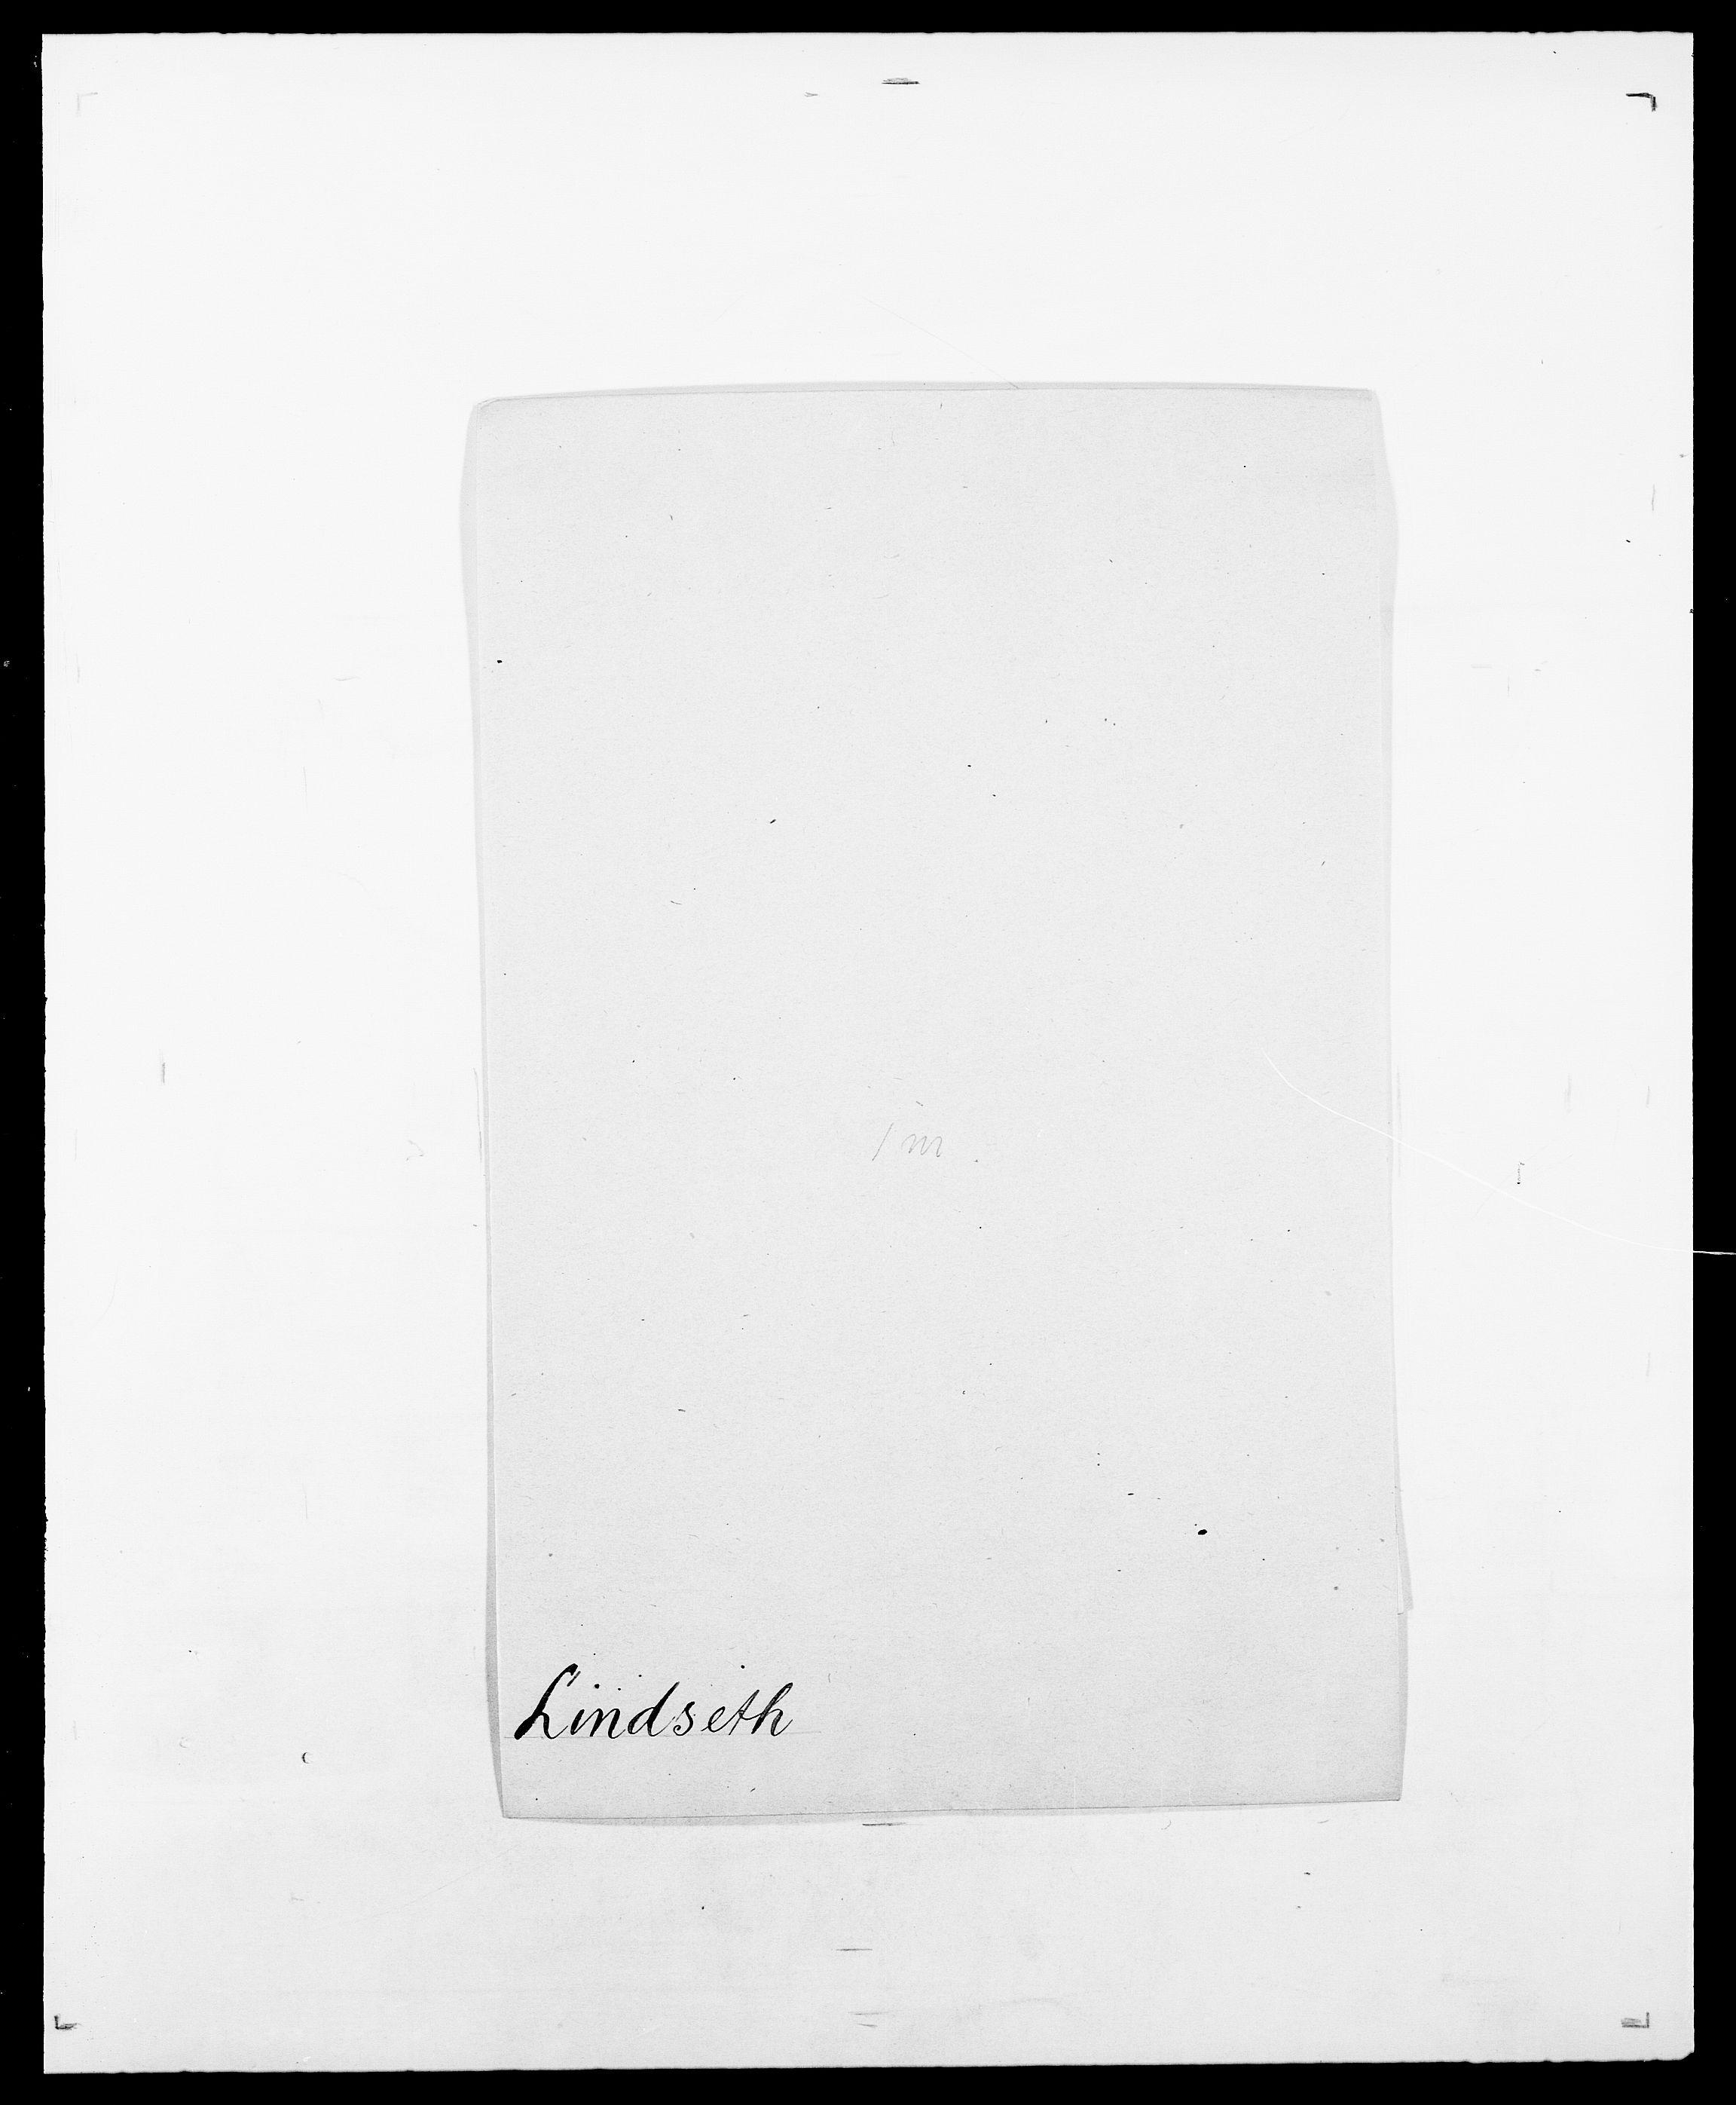 SAO, Delgobe, Charles Antoine - samling, D/Da/L0023: Lau - Lirvyn, s. 620